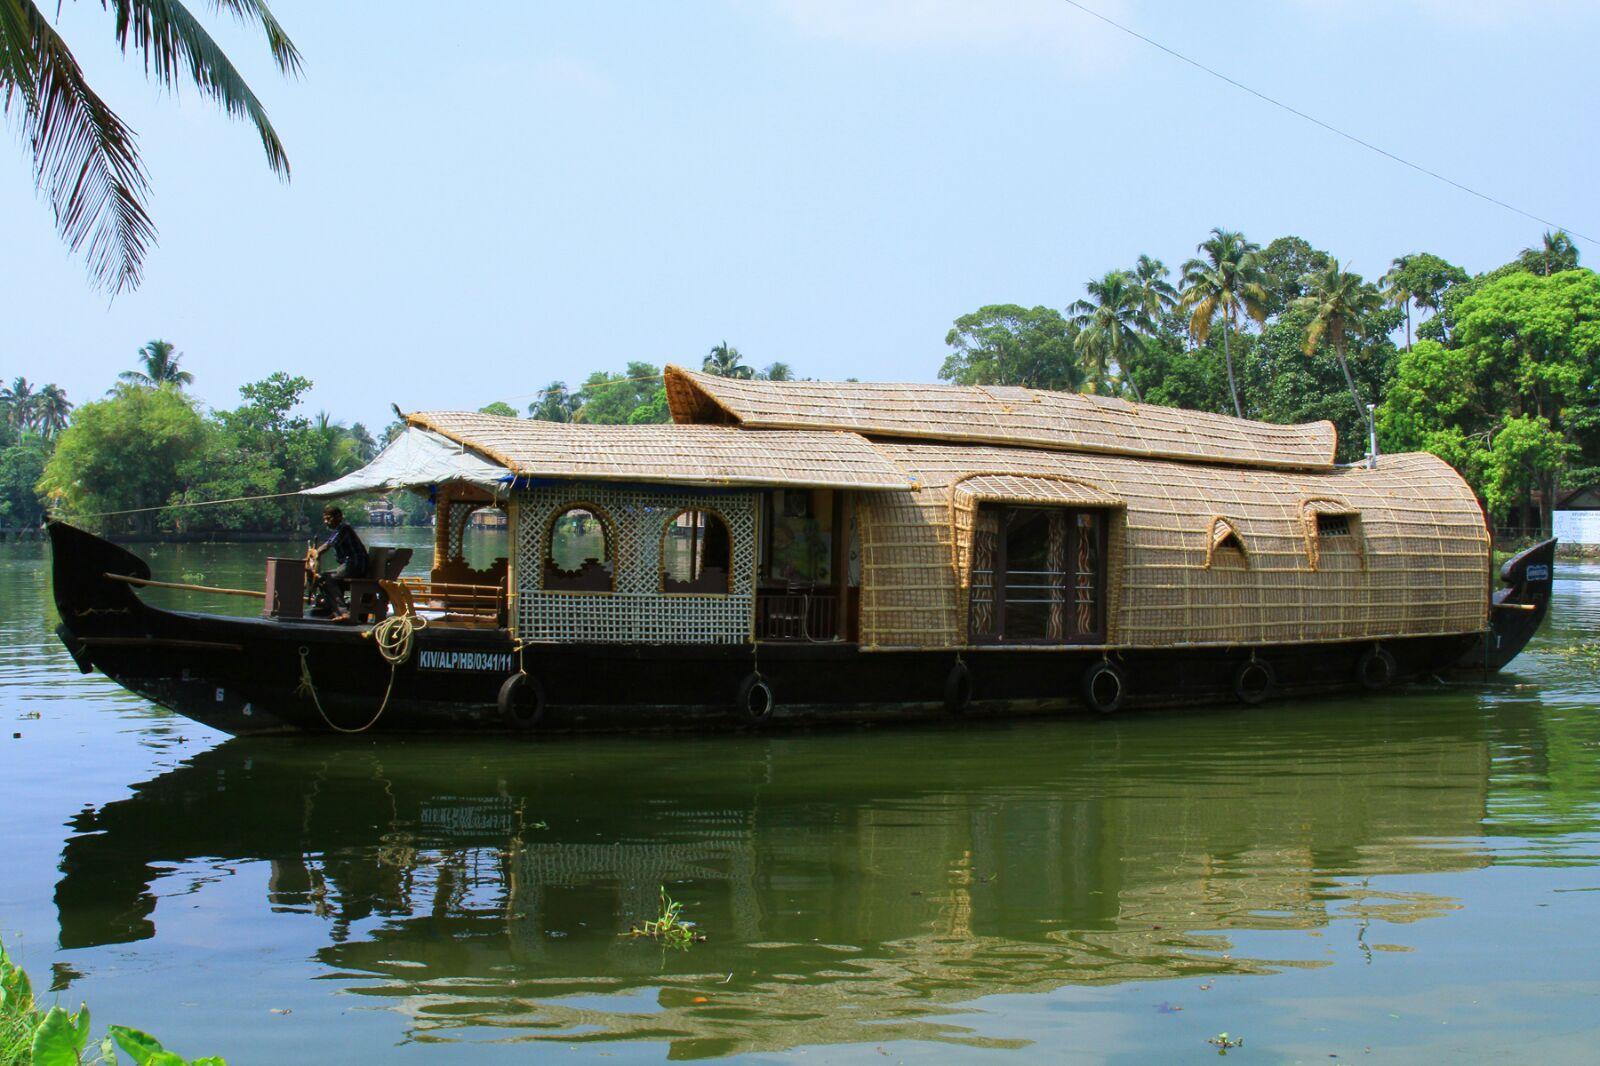 StayBoat Kumarakom, Kottayam